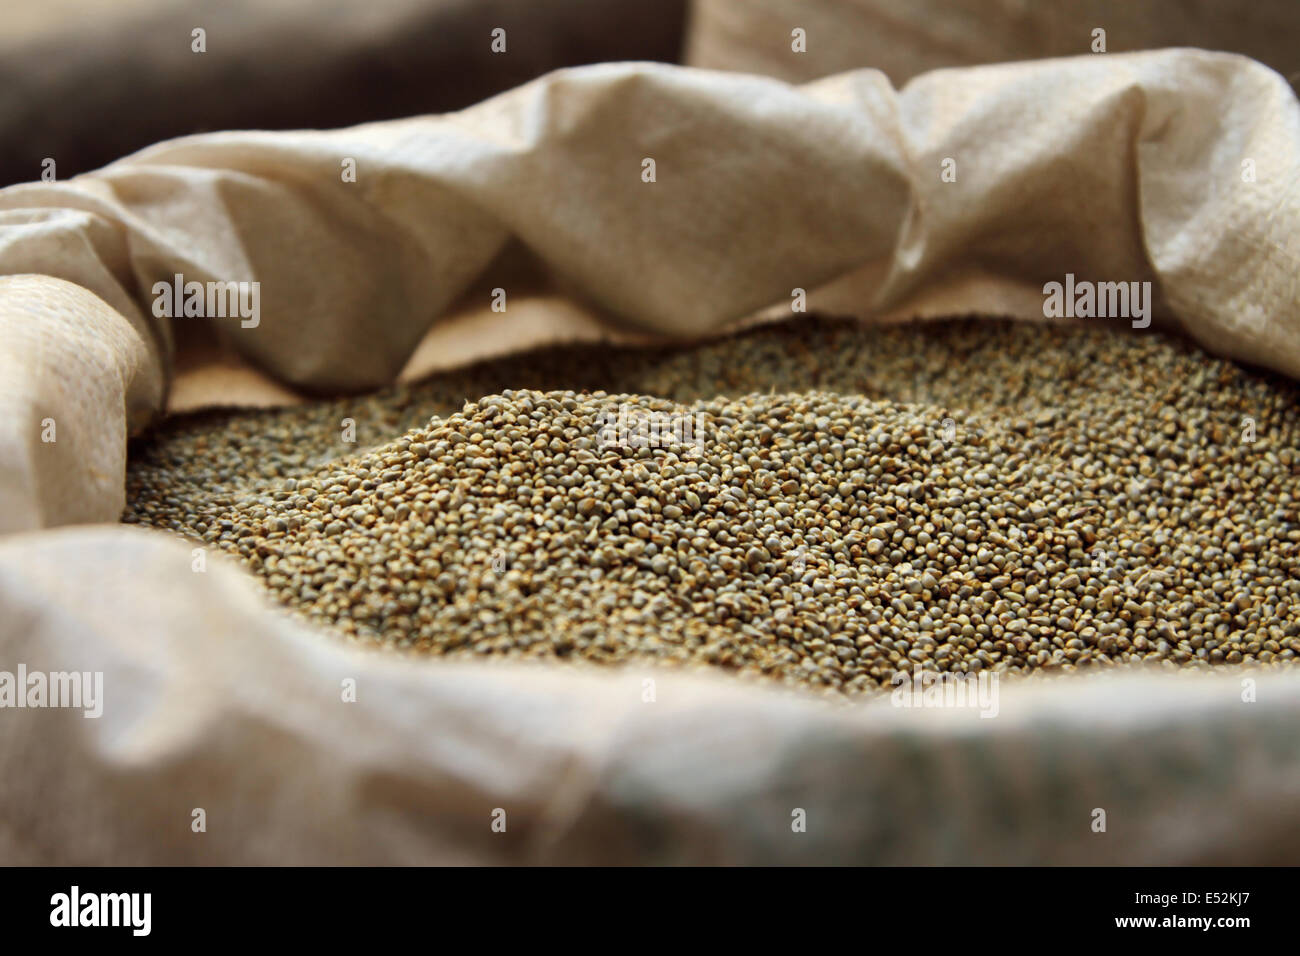 Sack full of bajra for sale - Stock Image